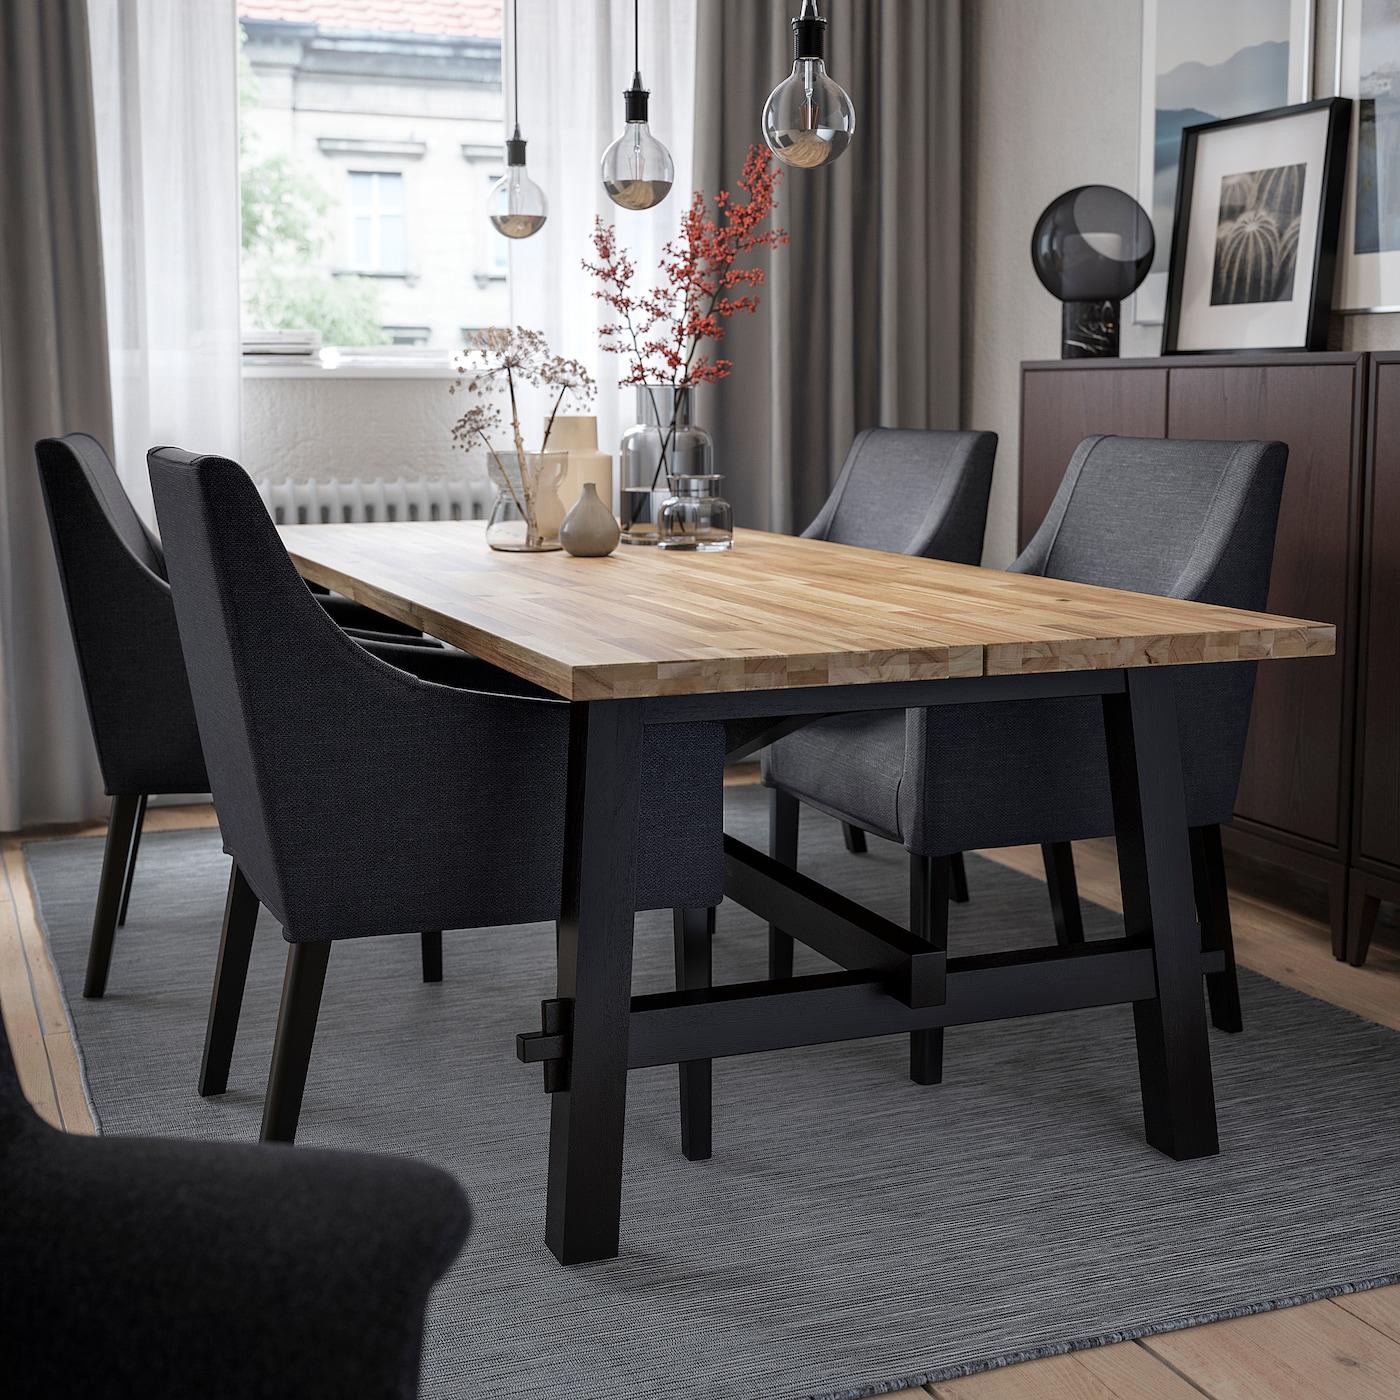 SKOGSTA Dining table - acacia 7x7 cm